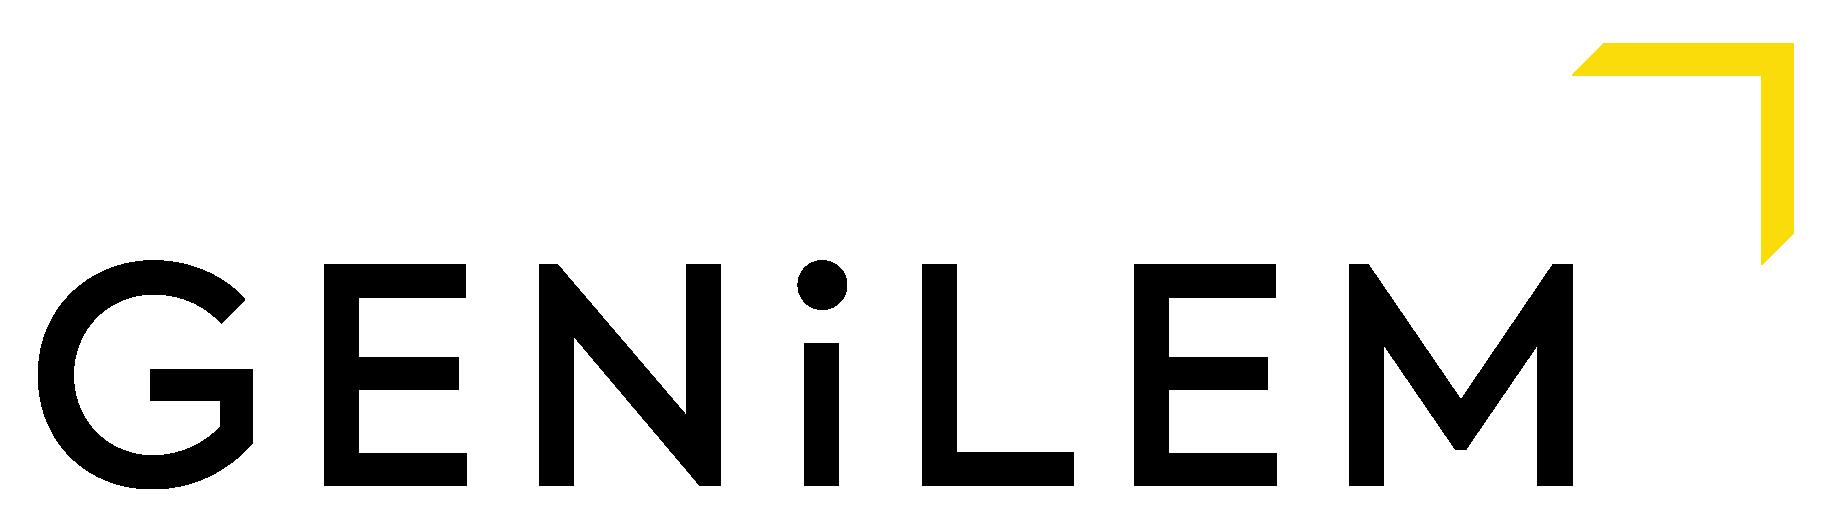 Genilem-logo-RVB-YELLOW.png